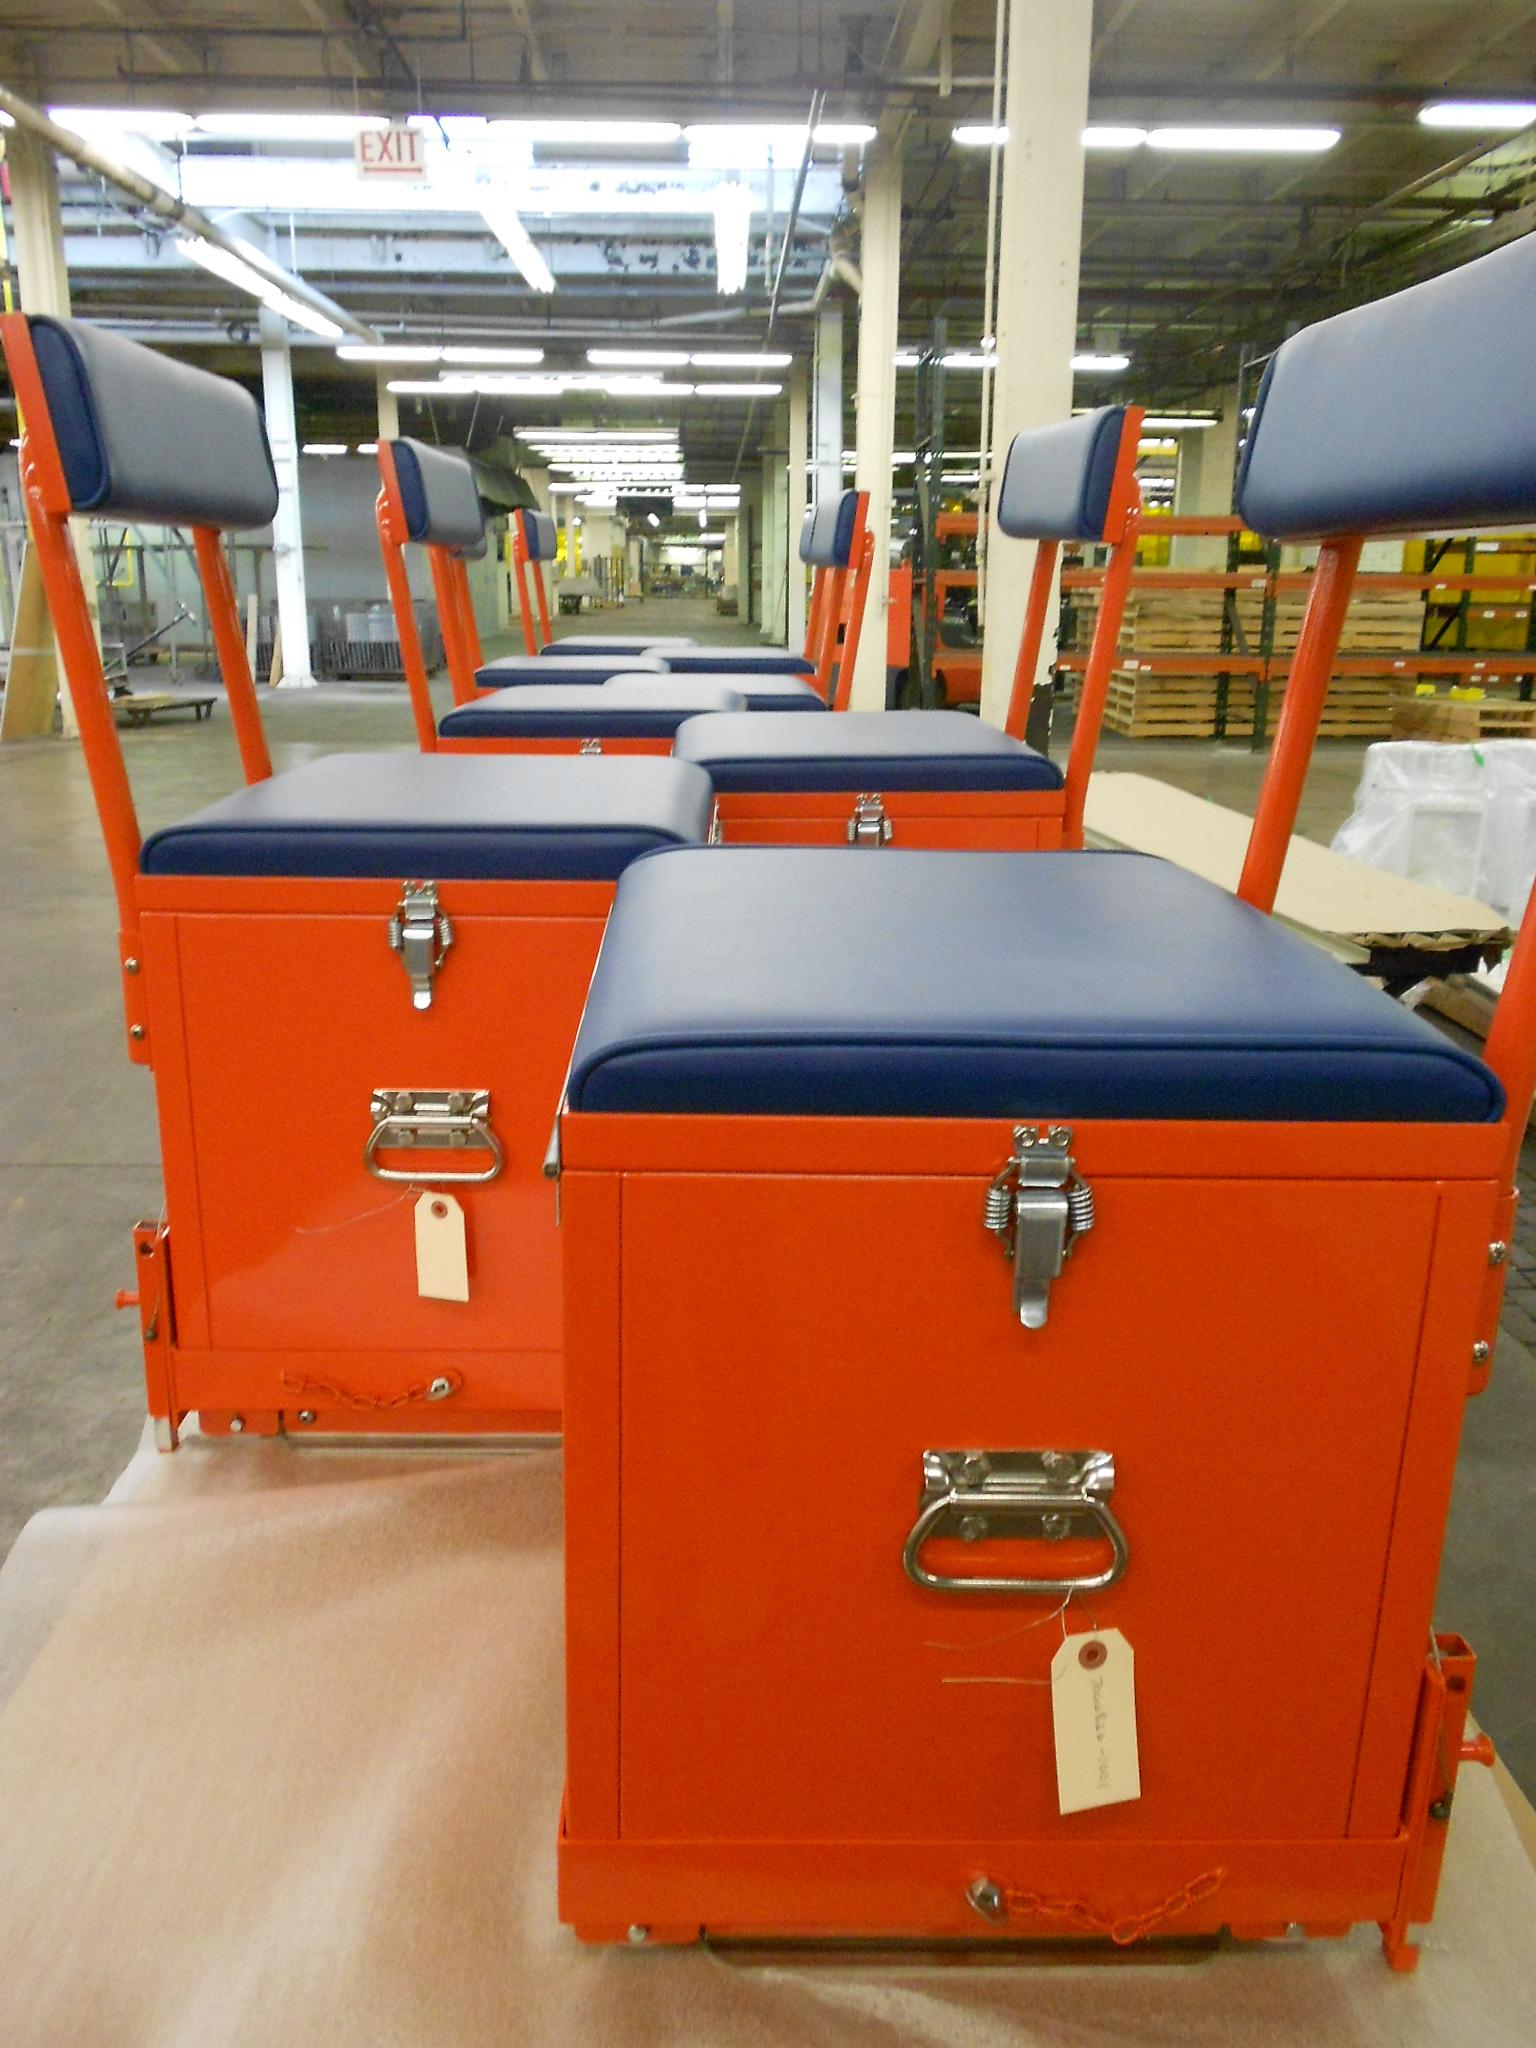 marine fabrication benches lockers